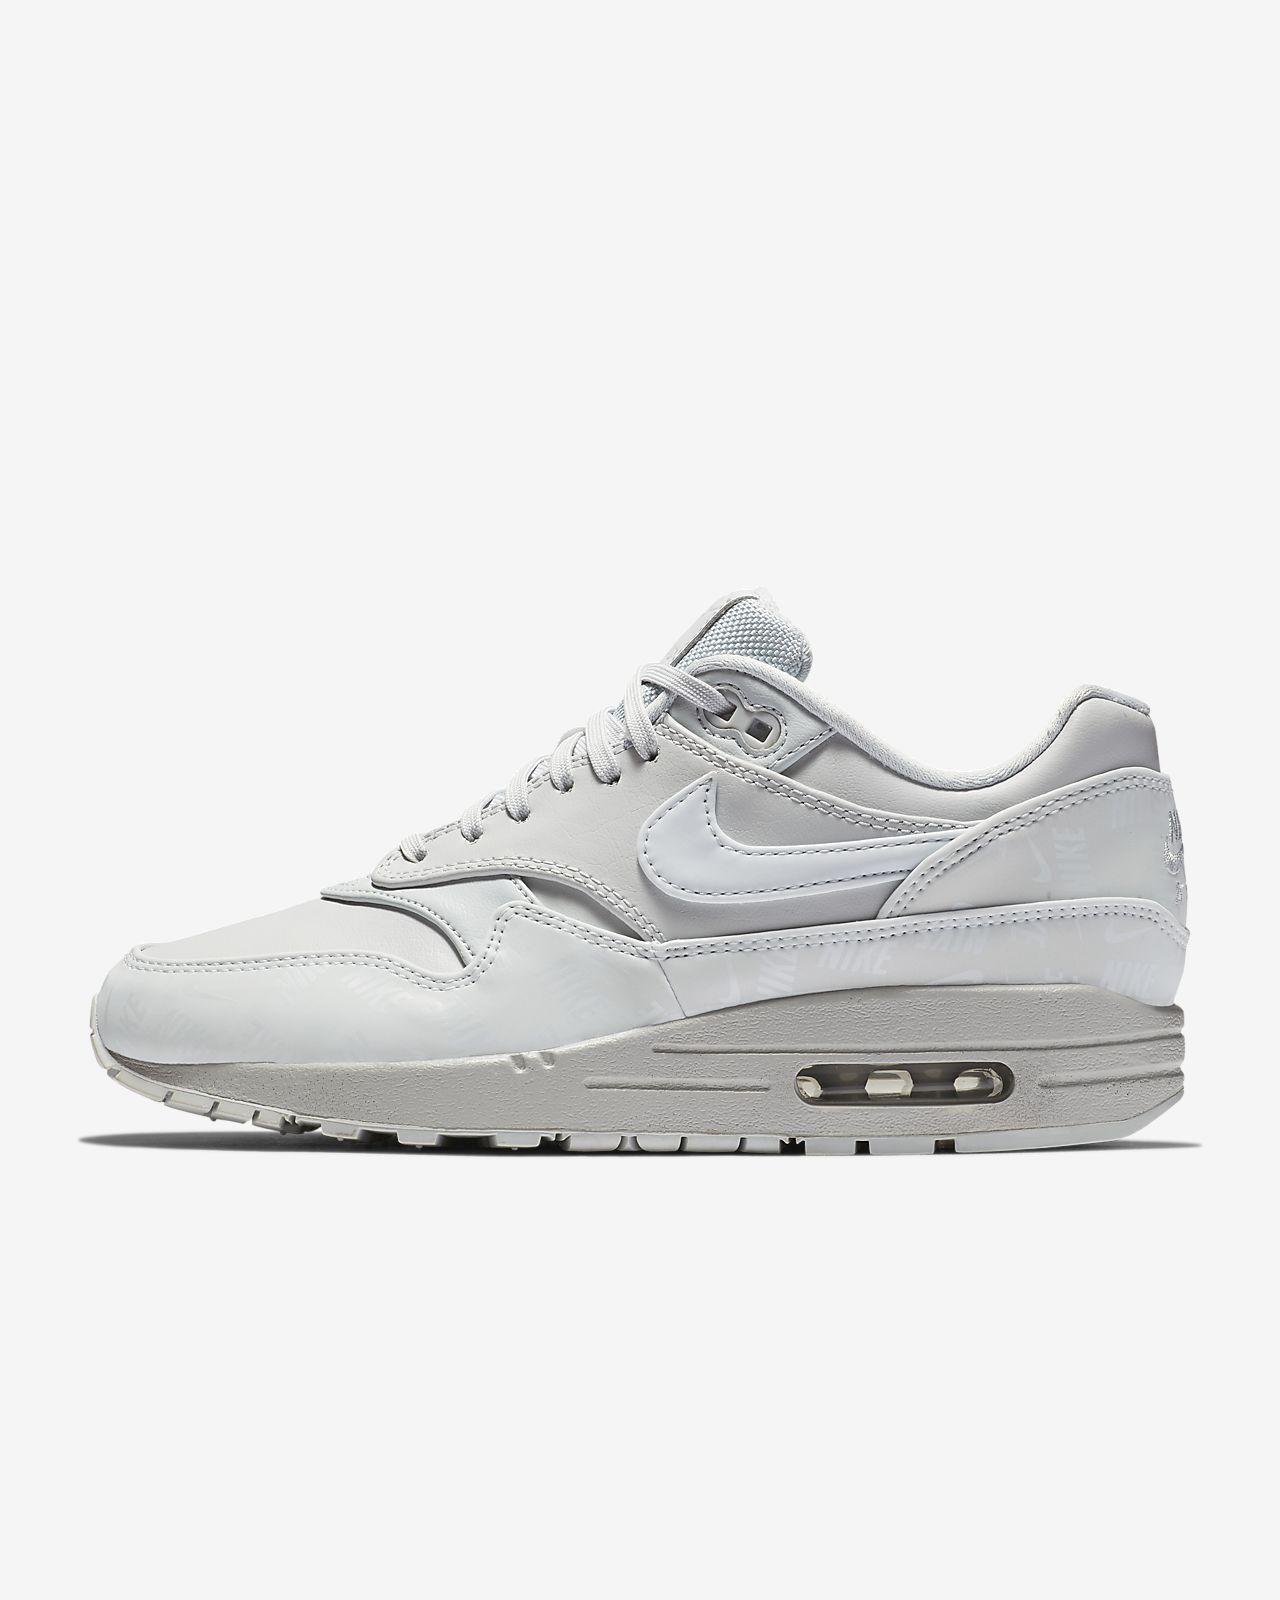 finest selection 3643b b44ed ... Nike Air Max 1 LX-sko til kvinder